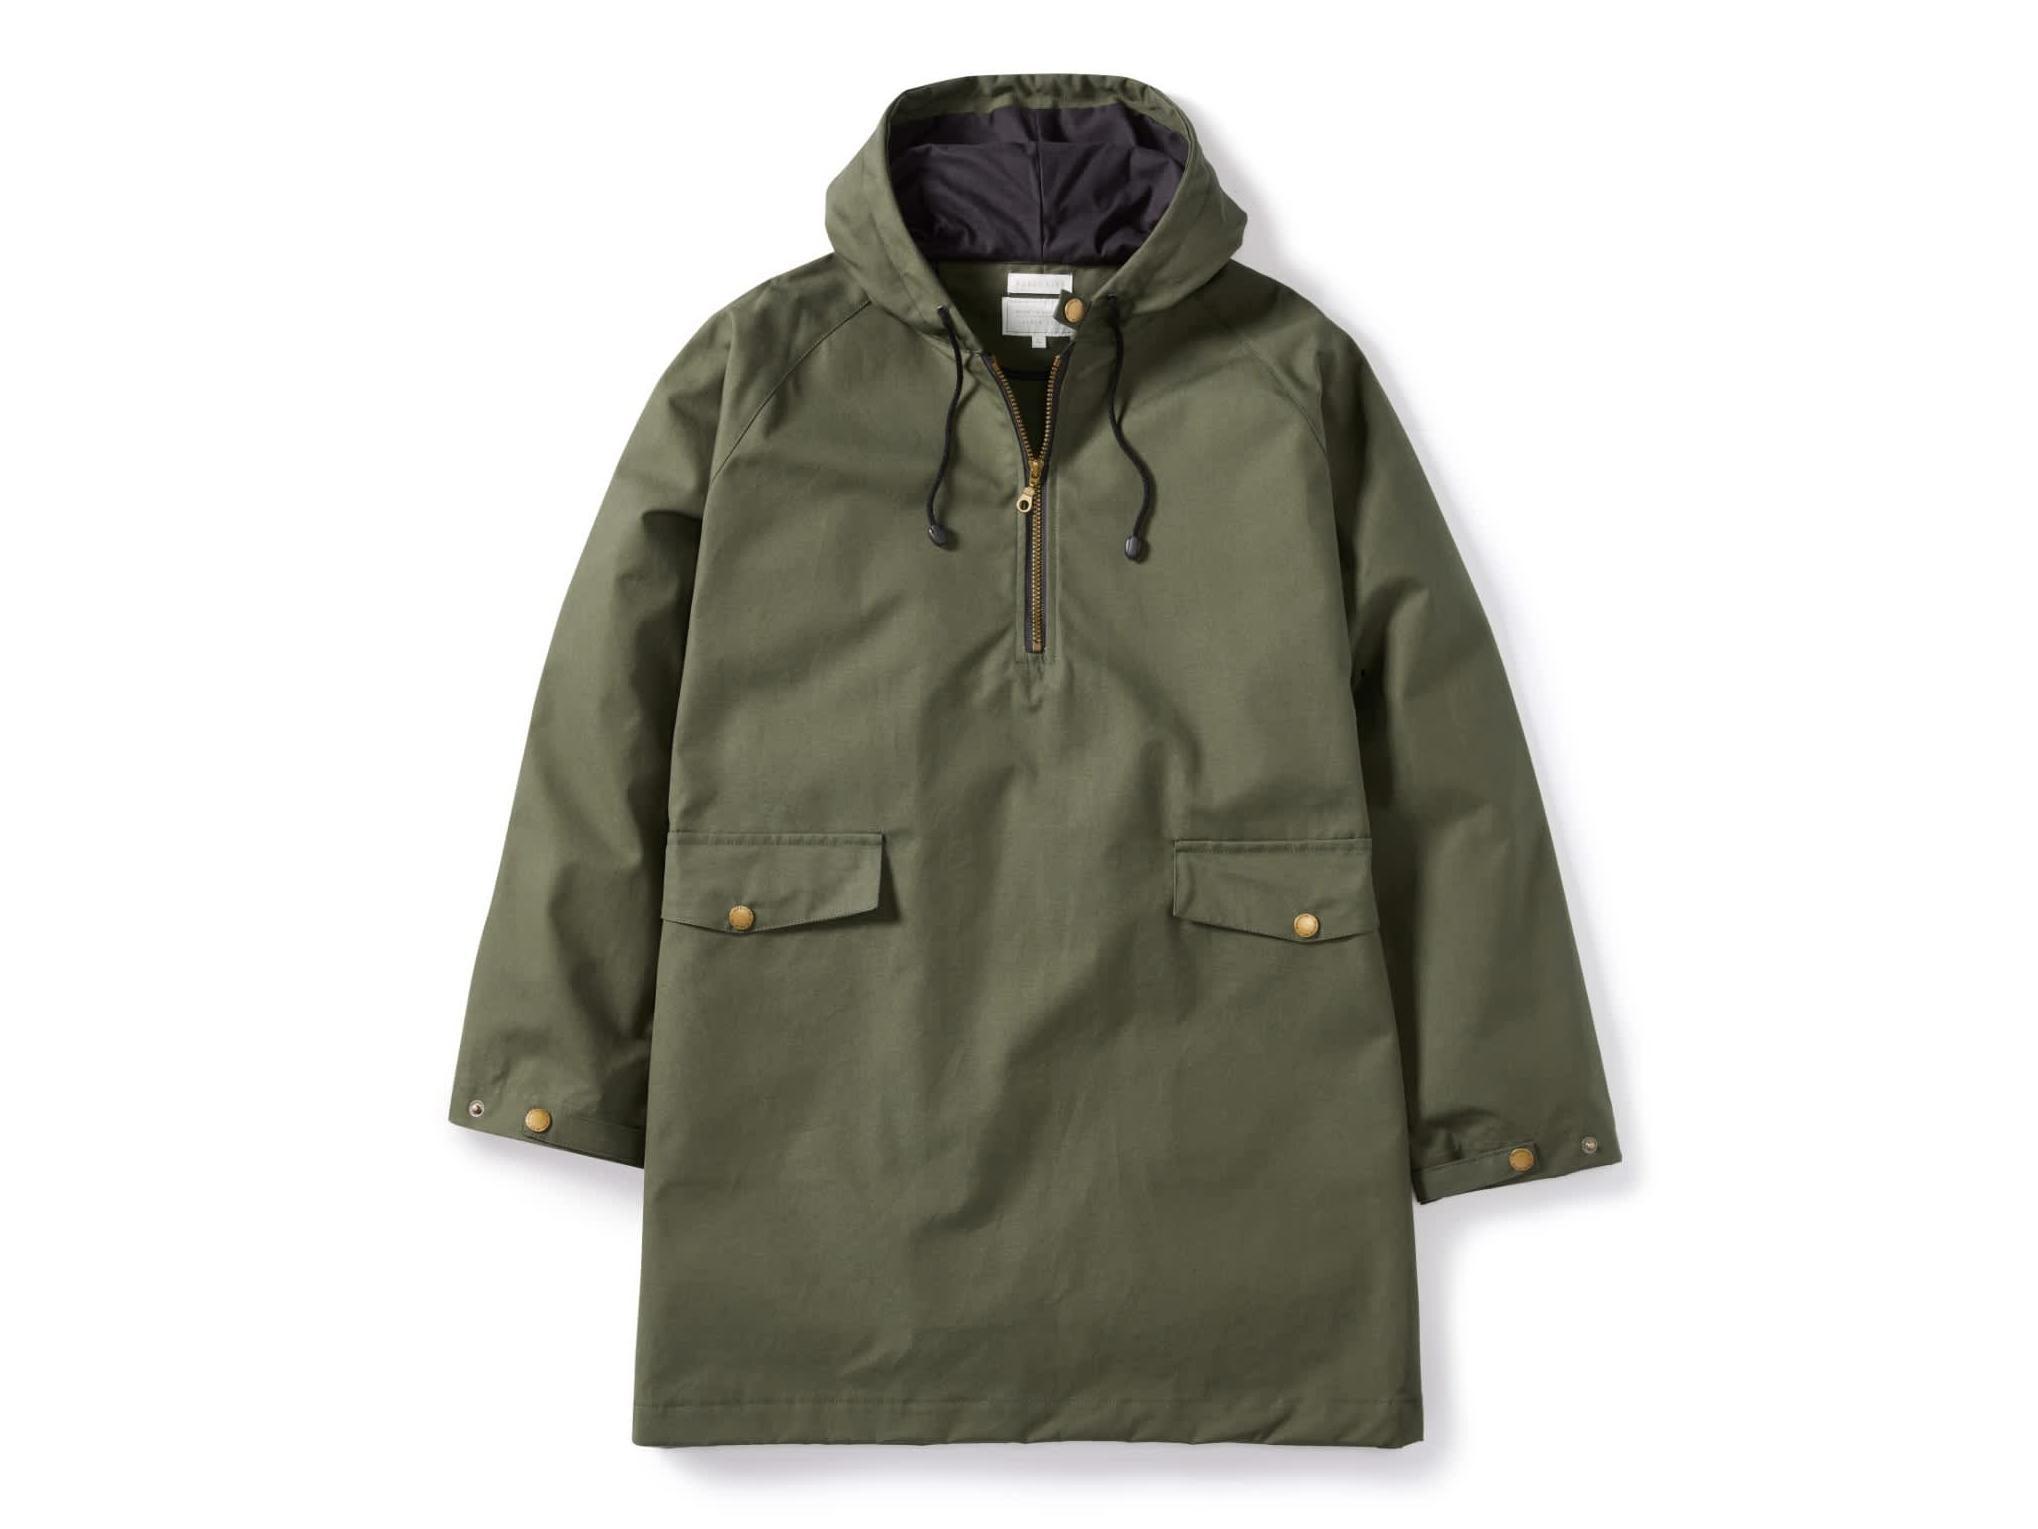 official official shop multiple colors Best men's waterproof jacket for festivals that is ...